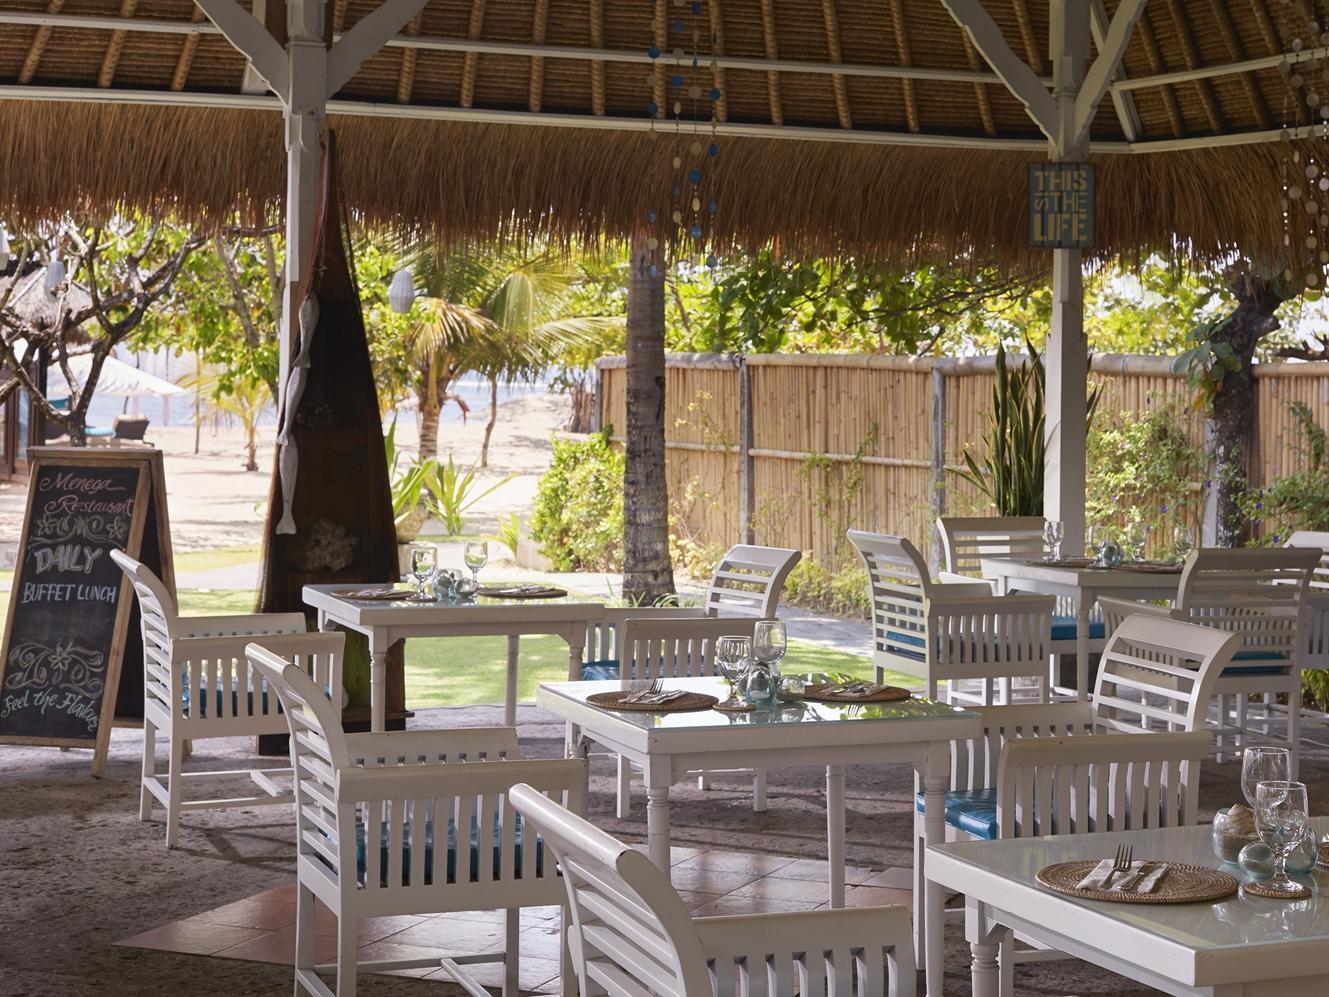 Sol Beach House Bali-Benoa by Melia Hotels International